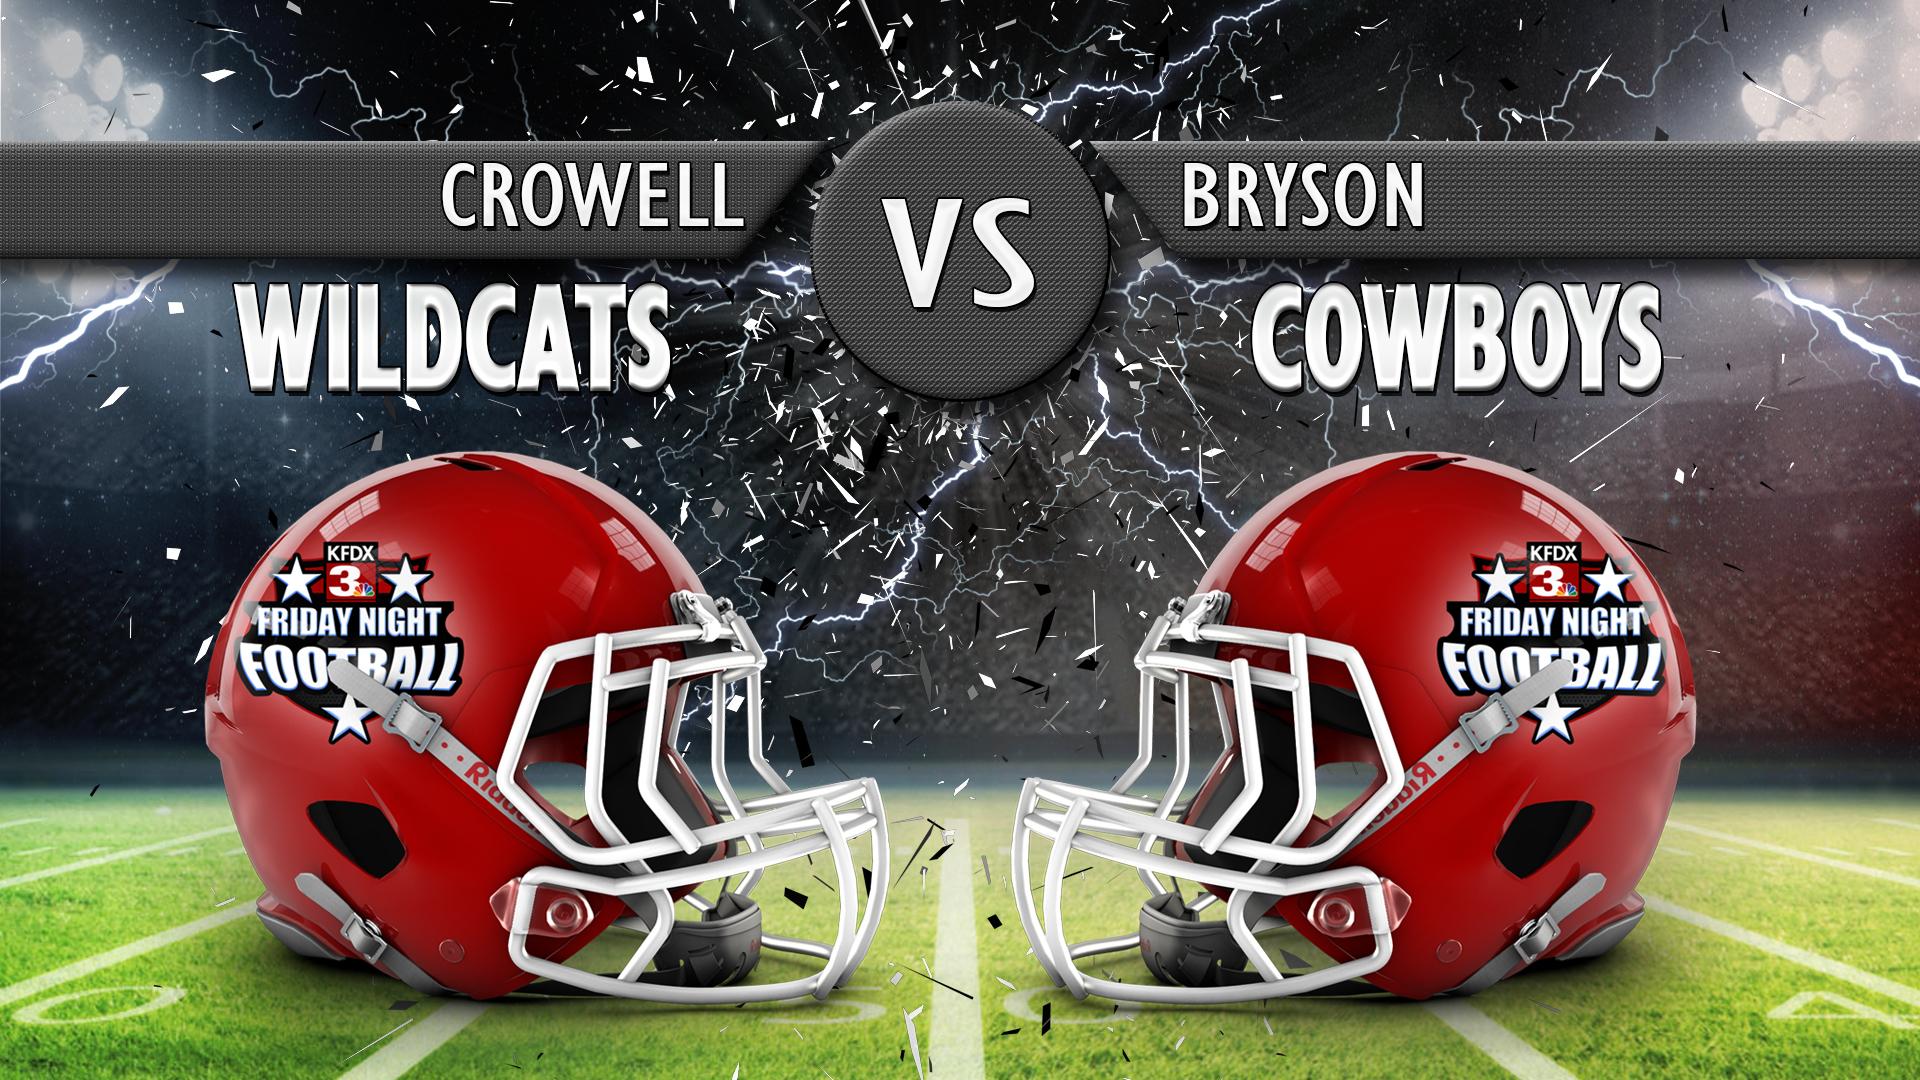 CROWELL VS BRYSON_1538781439501.jpg.jpg